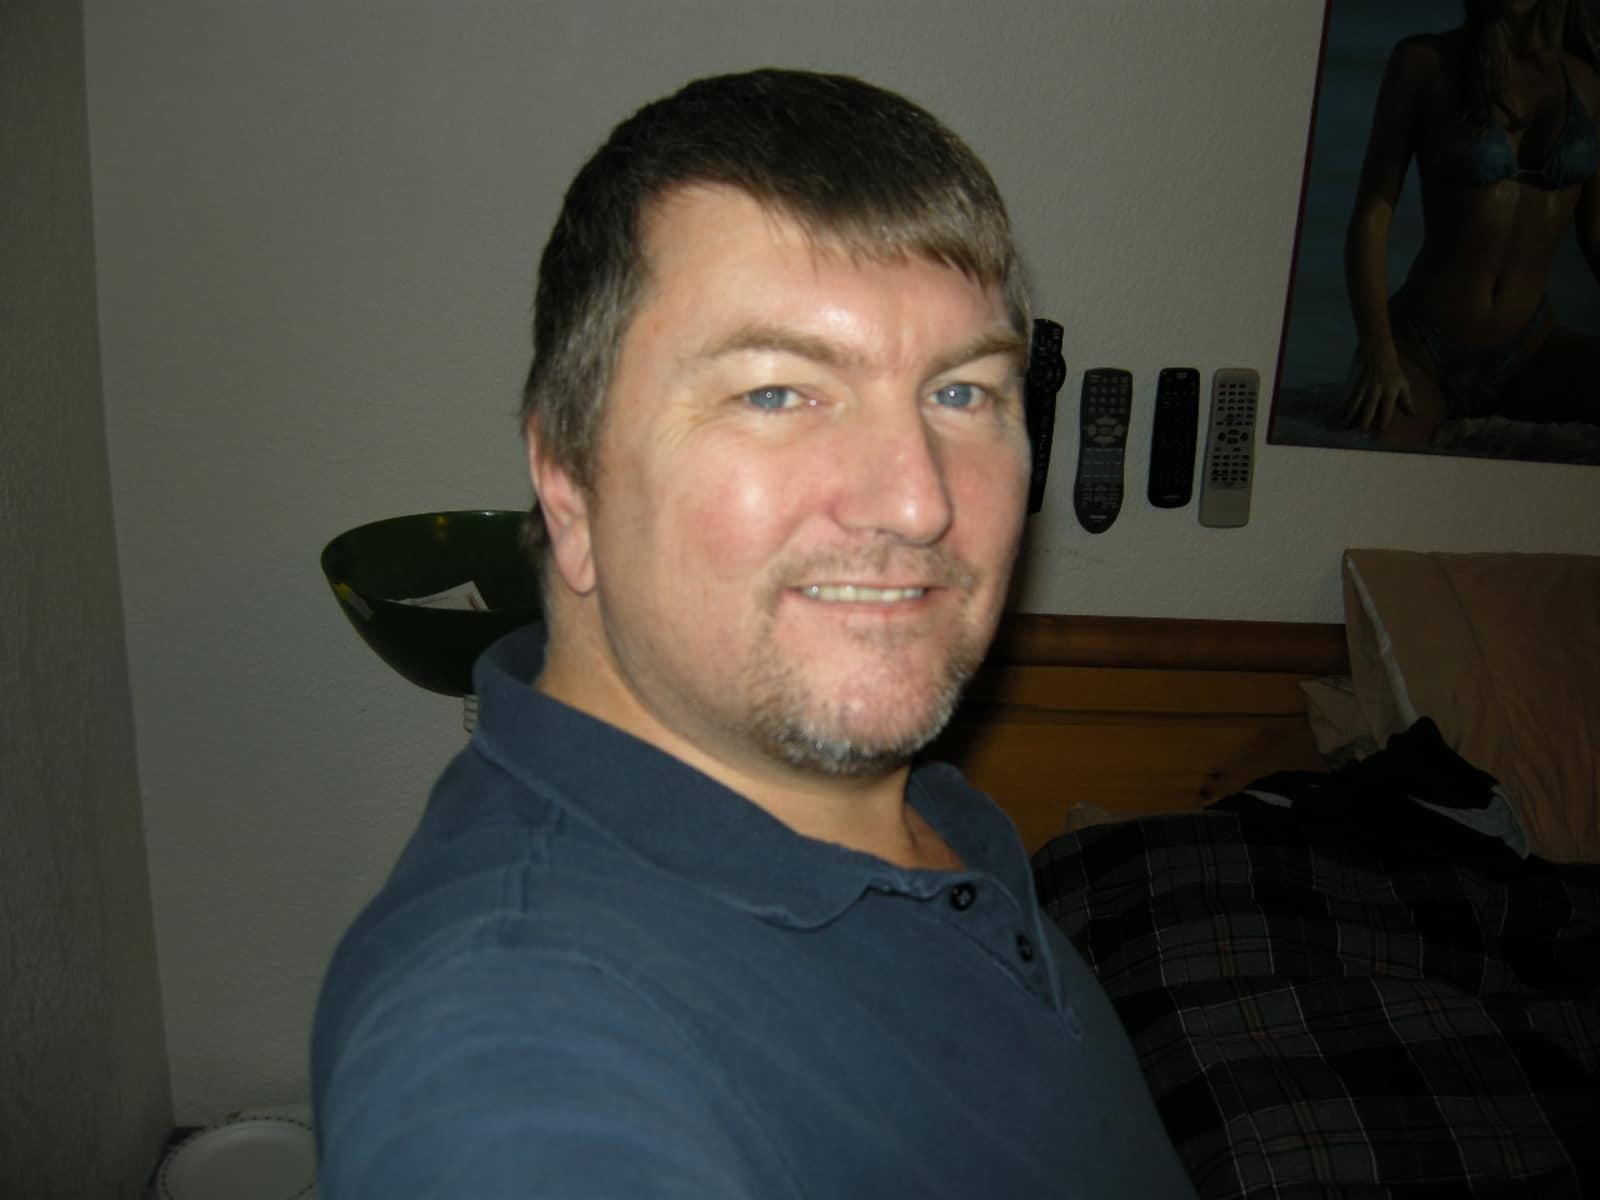 Stephen from Victoria, British Columbia, Canada